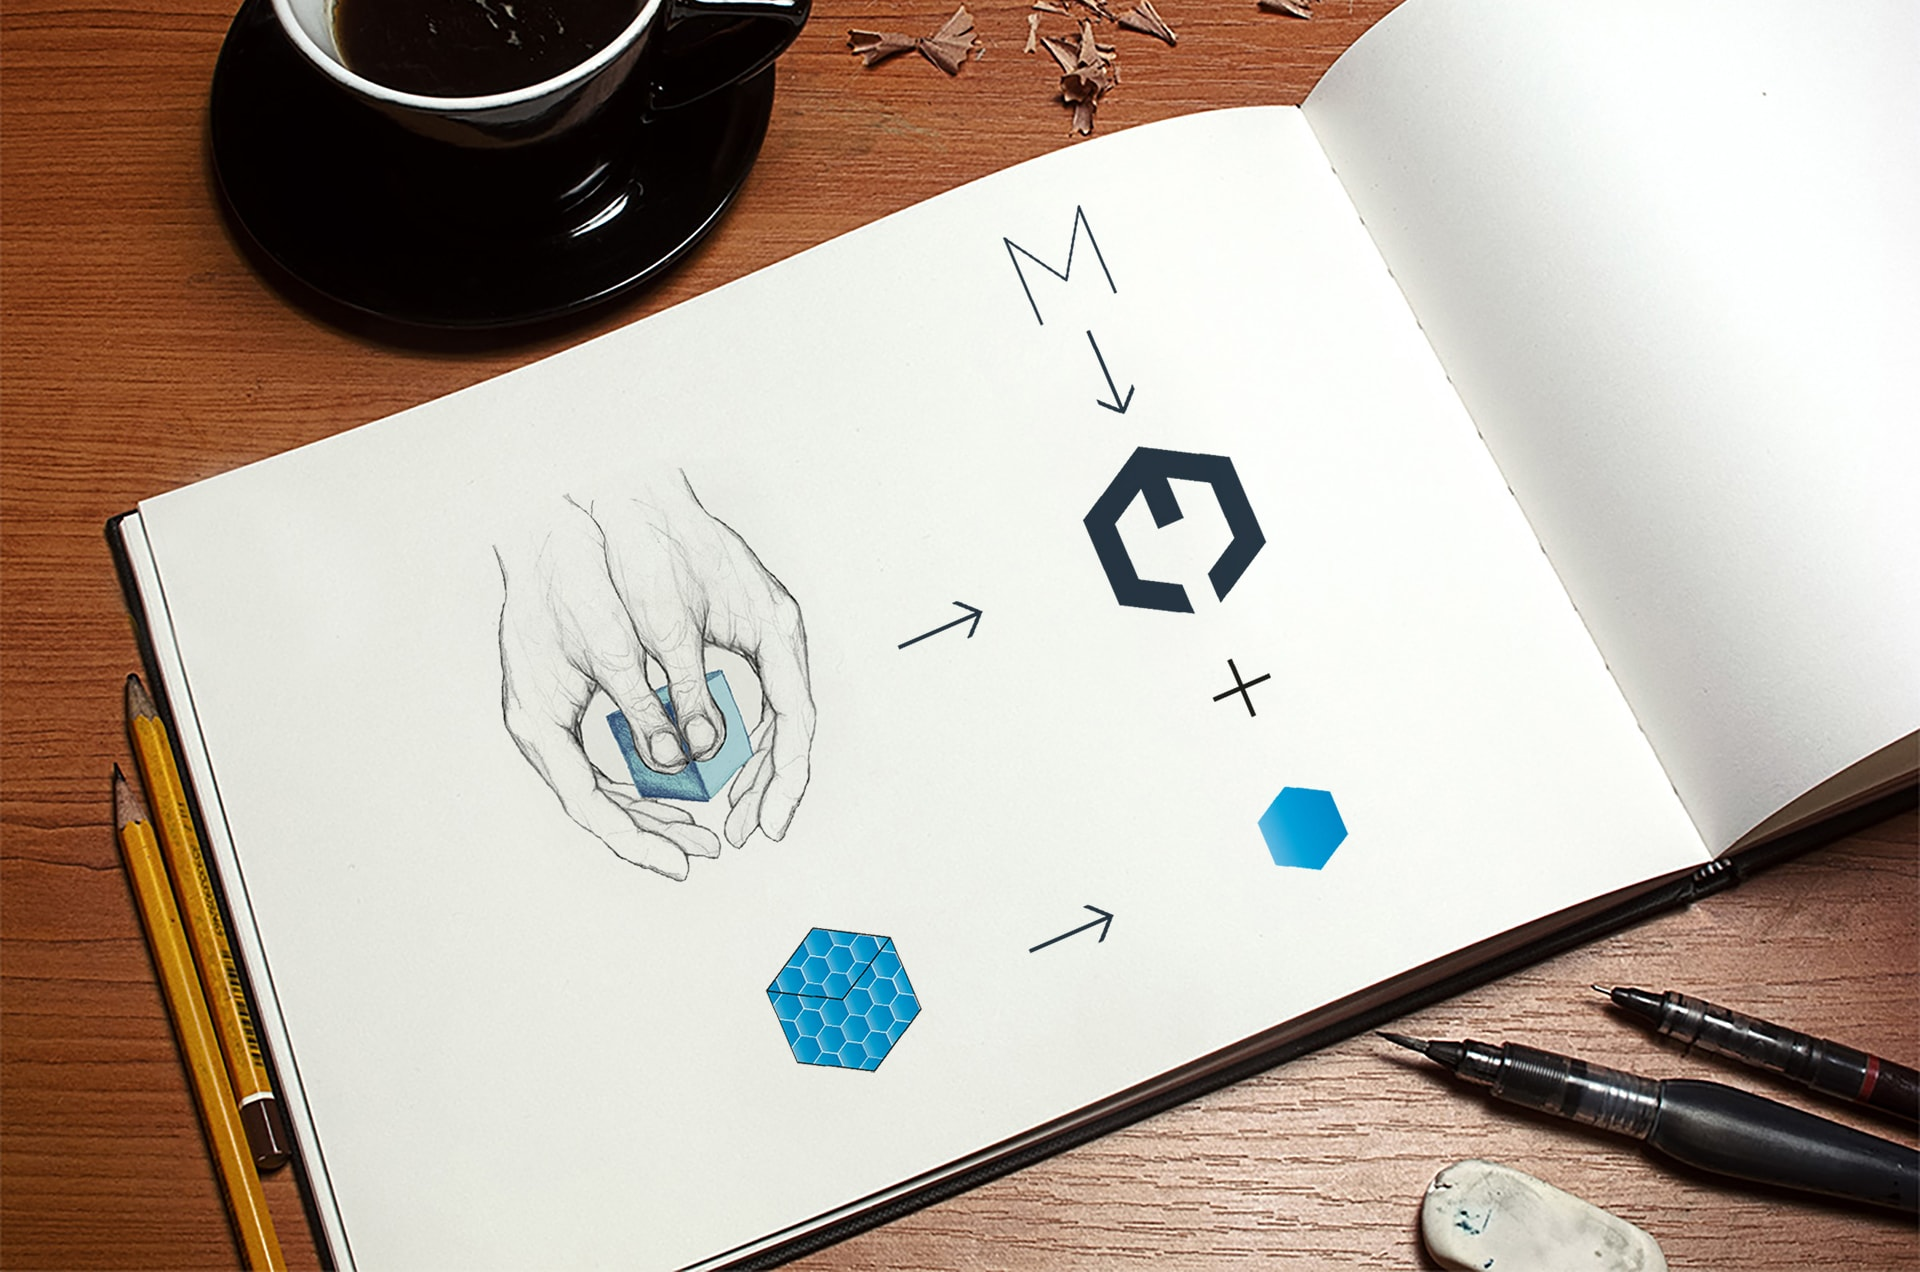 Identité visuelle du Groupe Meda Holding